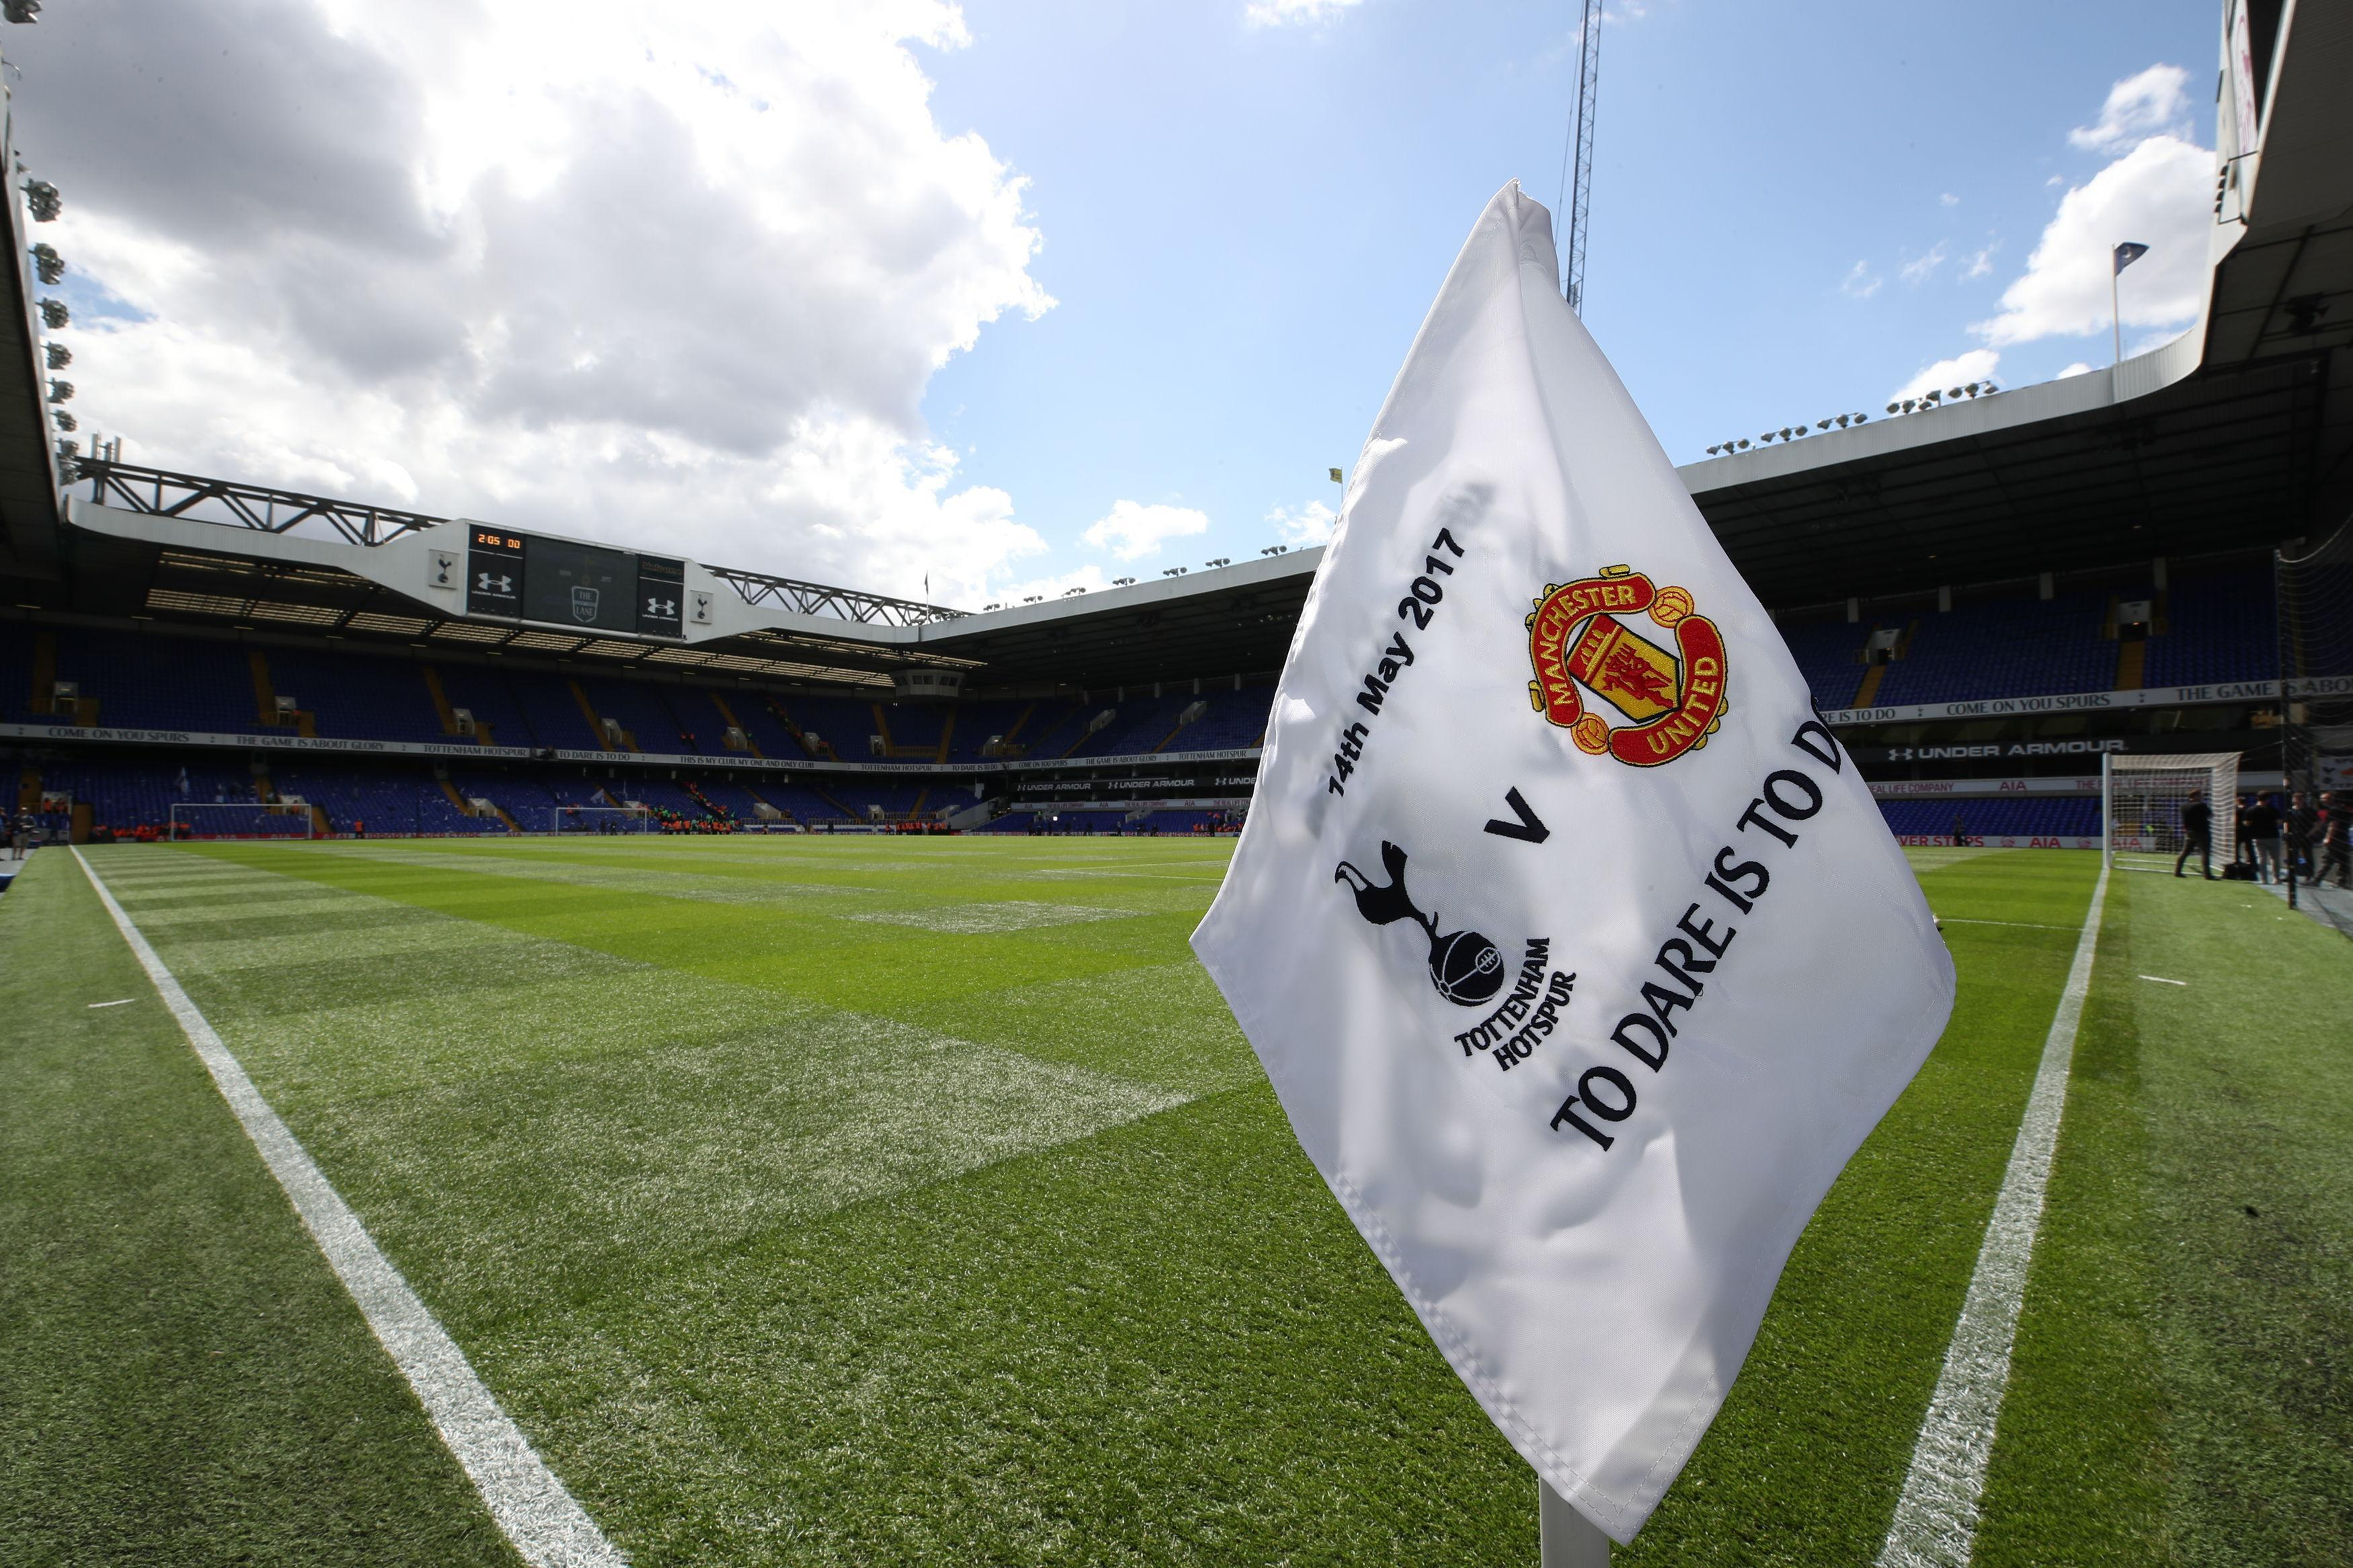 13c13569b5a Tottenham bid an emotional farewell to White Hart Lane against Manchester  United earlier this year